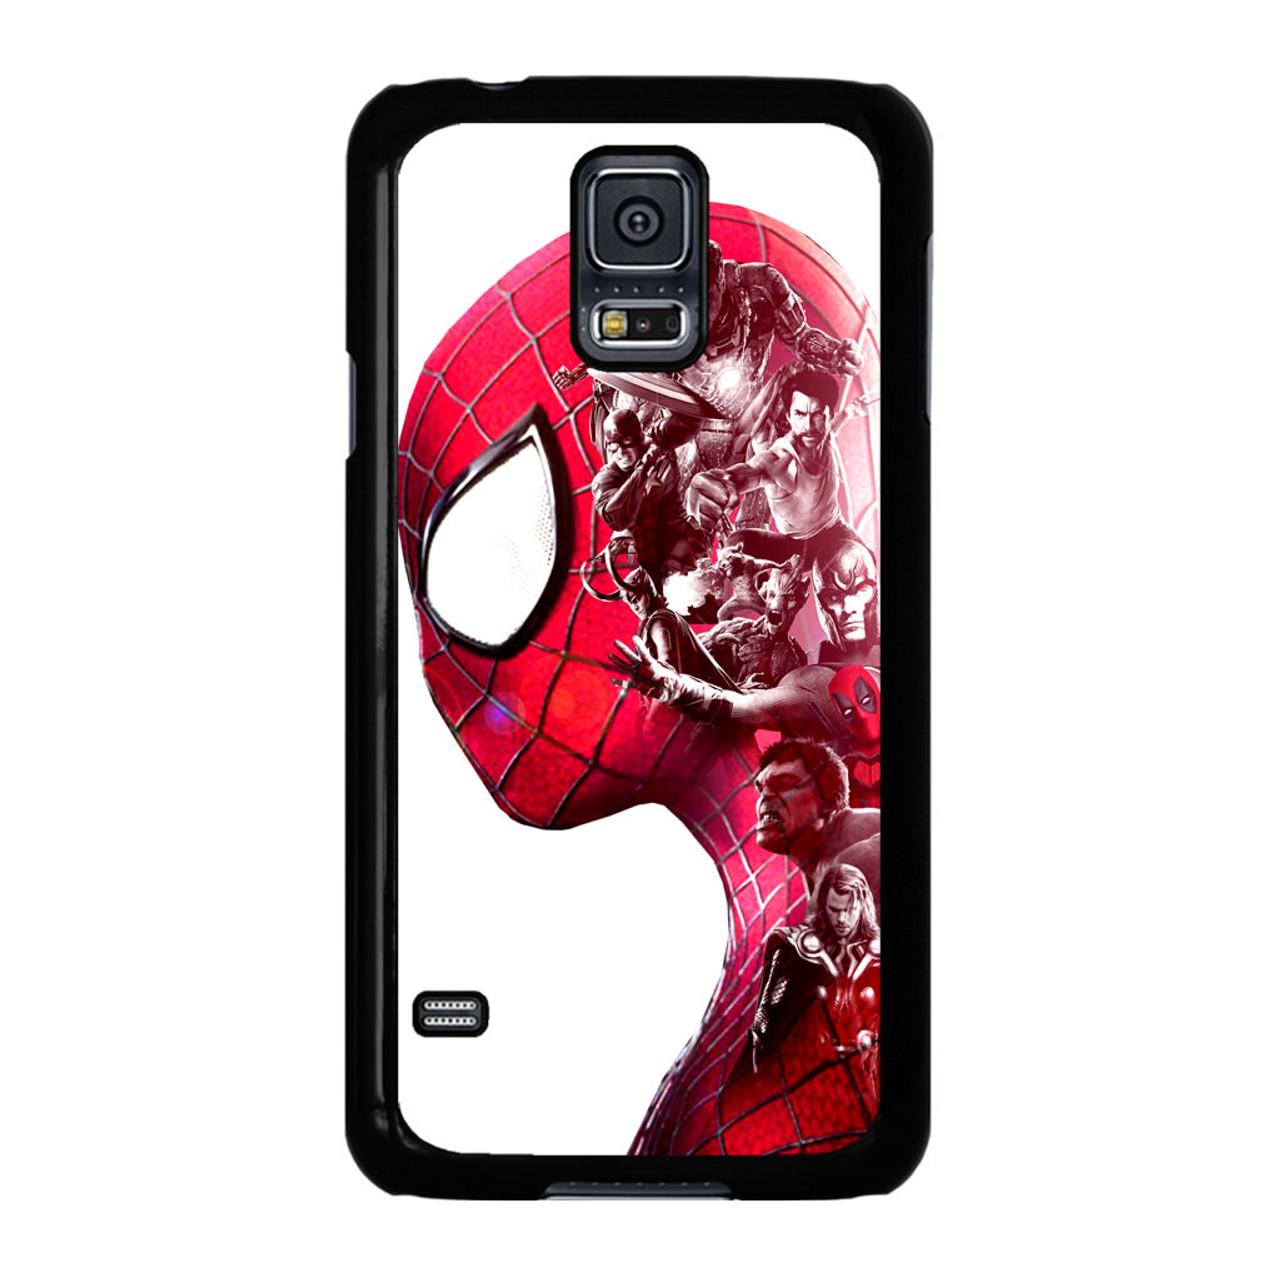 huge selection of c553c 886f5 Spiderman Superheroes Marvel Samsung Galaxy S5 Case